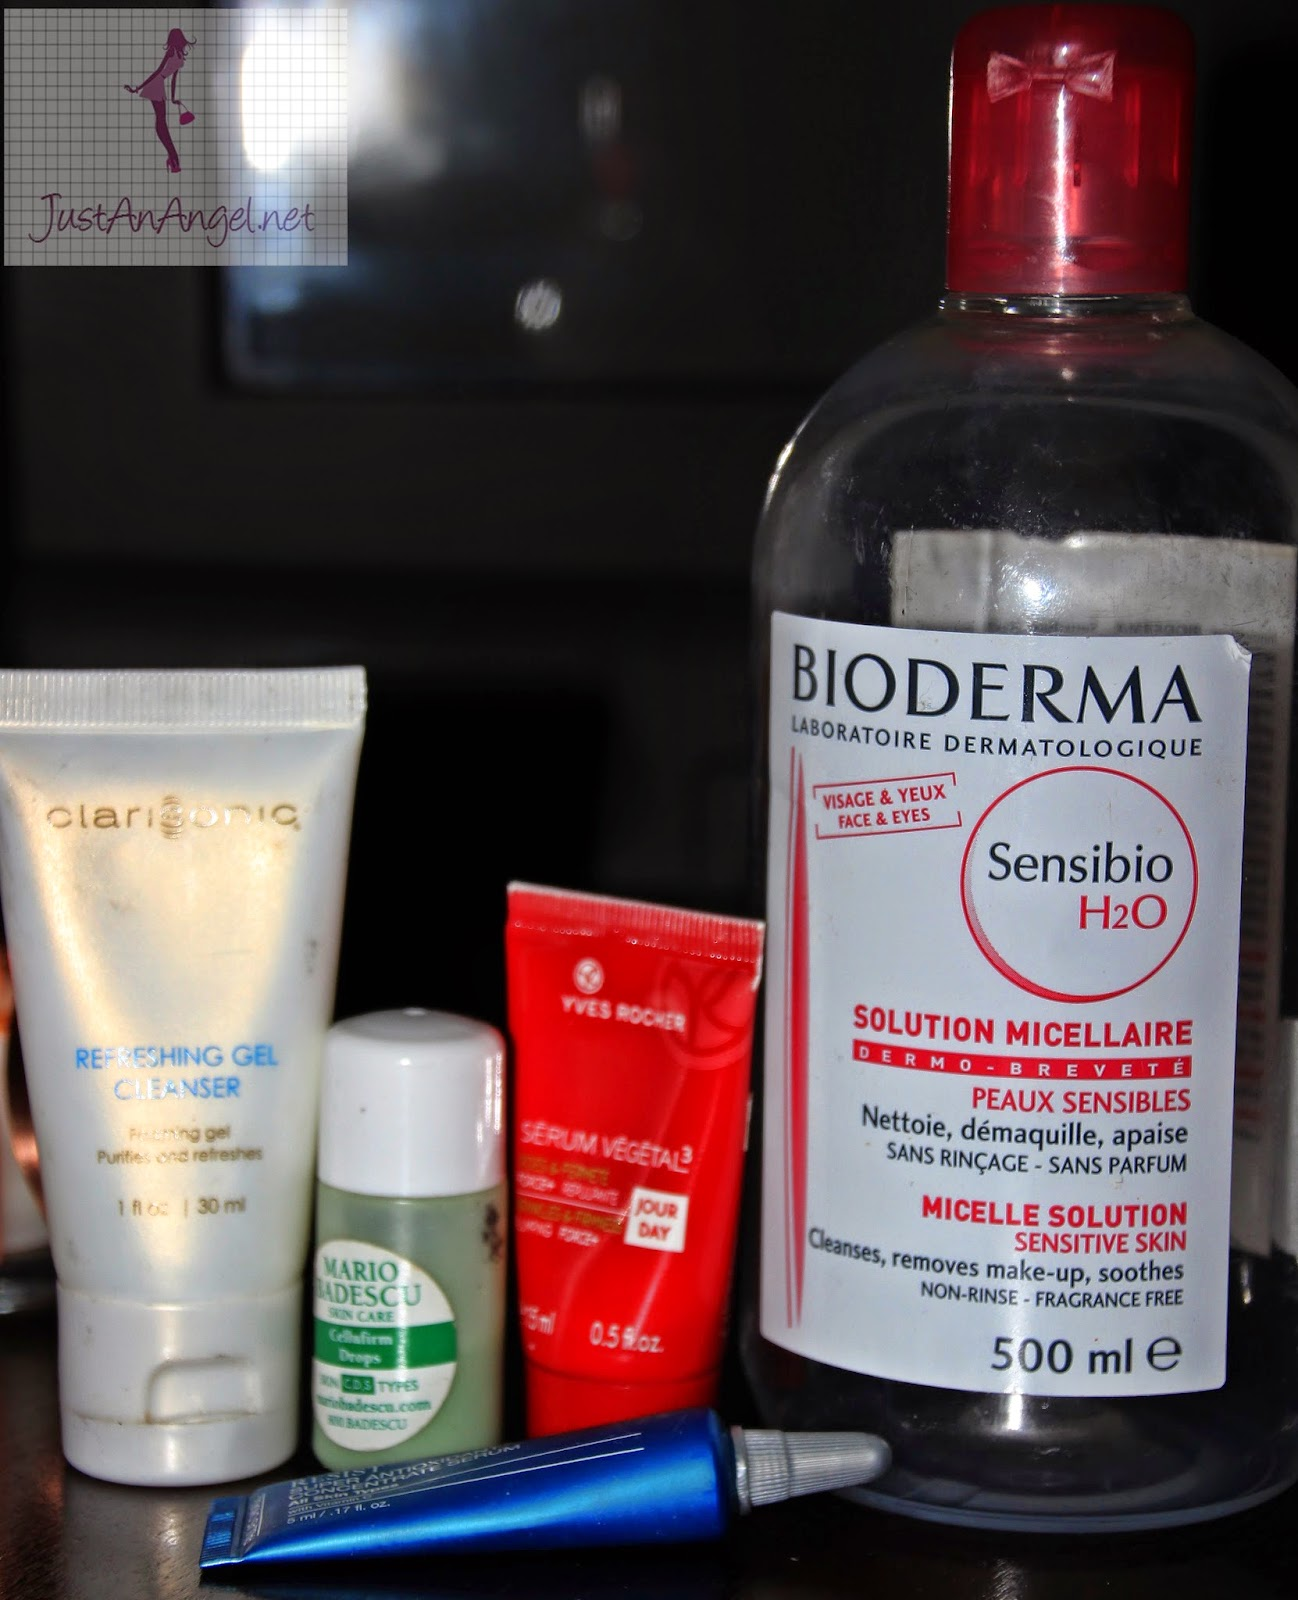 cleanser Clarisonic Mario Badescu drops apa micelara Bioderma Serum Paula's choice Resist